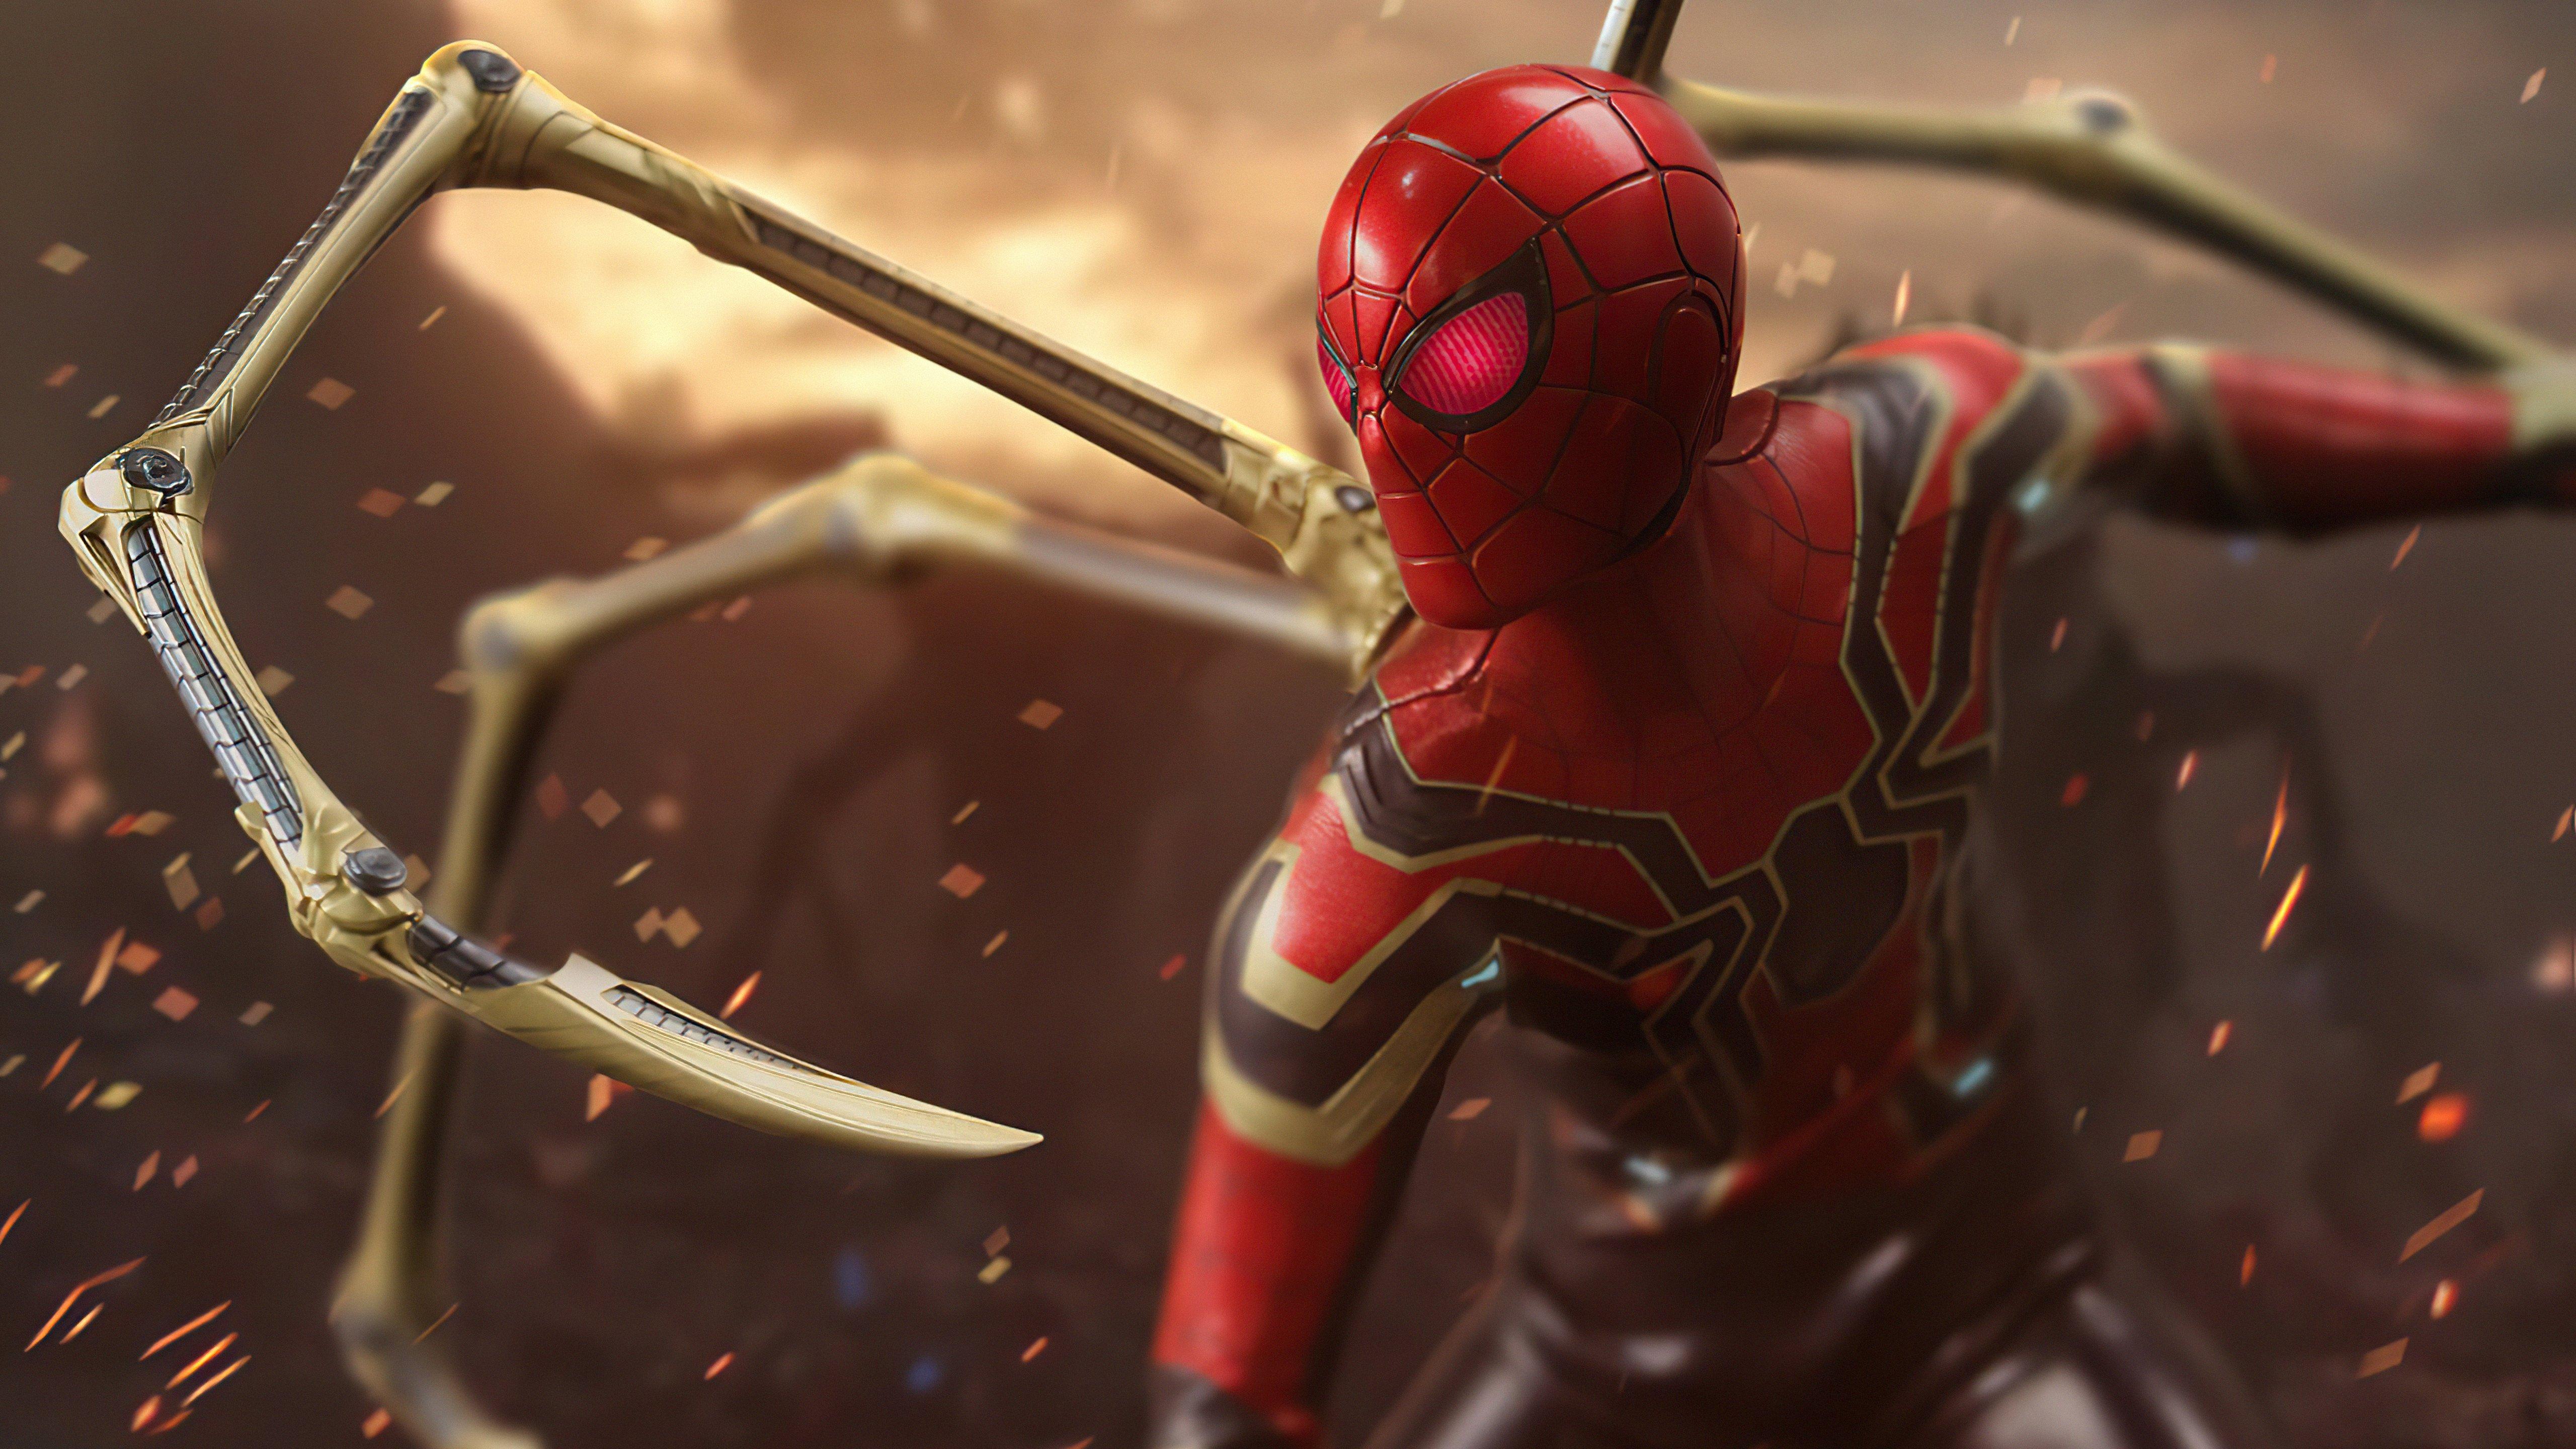 Fondos de pantalla Iron Spider ojos rojos